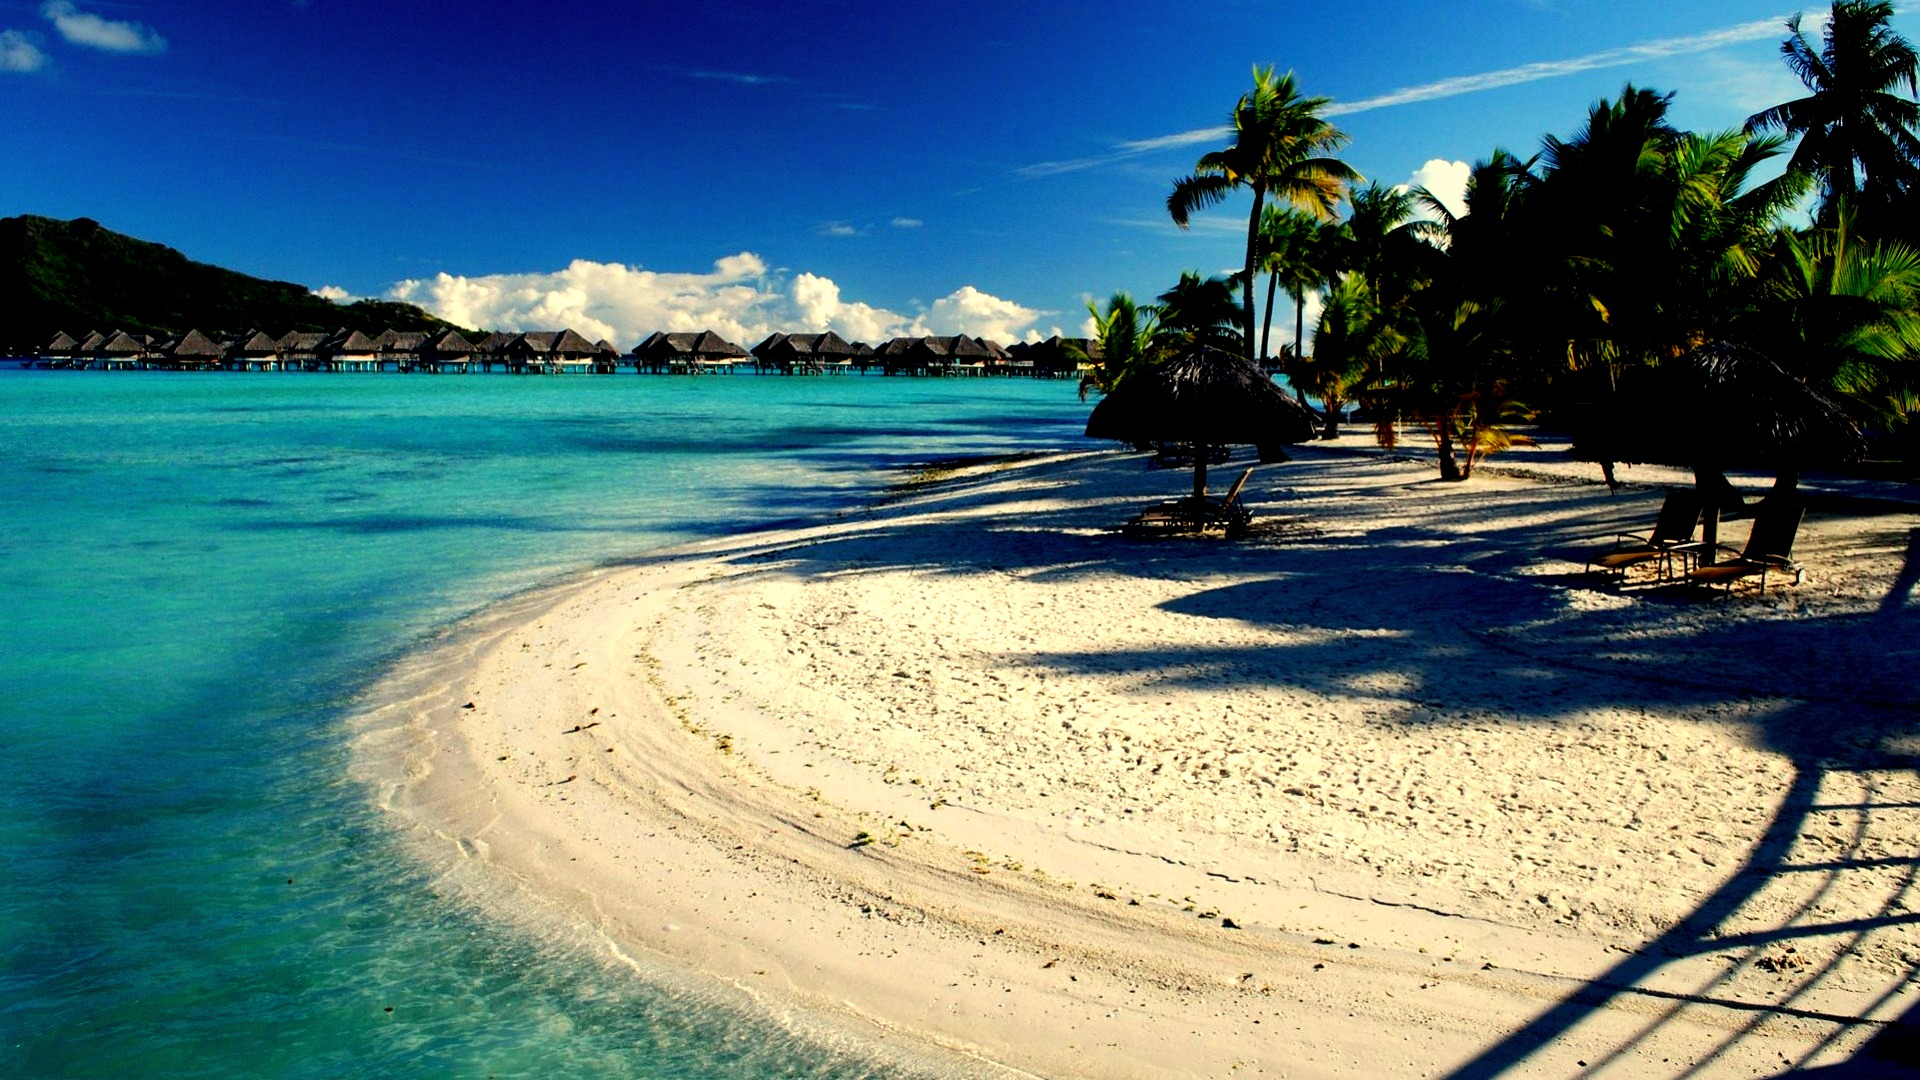 Spiagge sfondi per pc 1920x1080 id 402164 for Sfondi spiagge hd